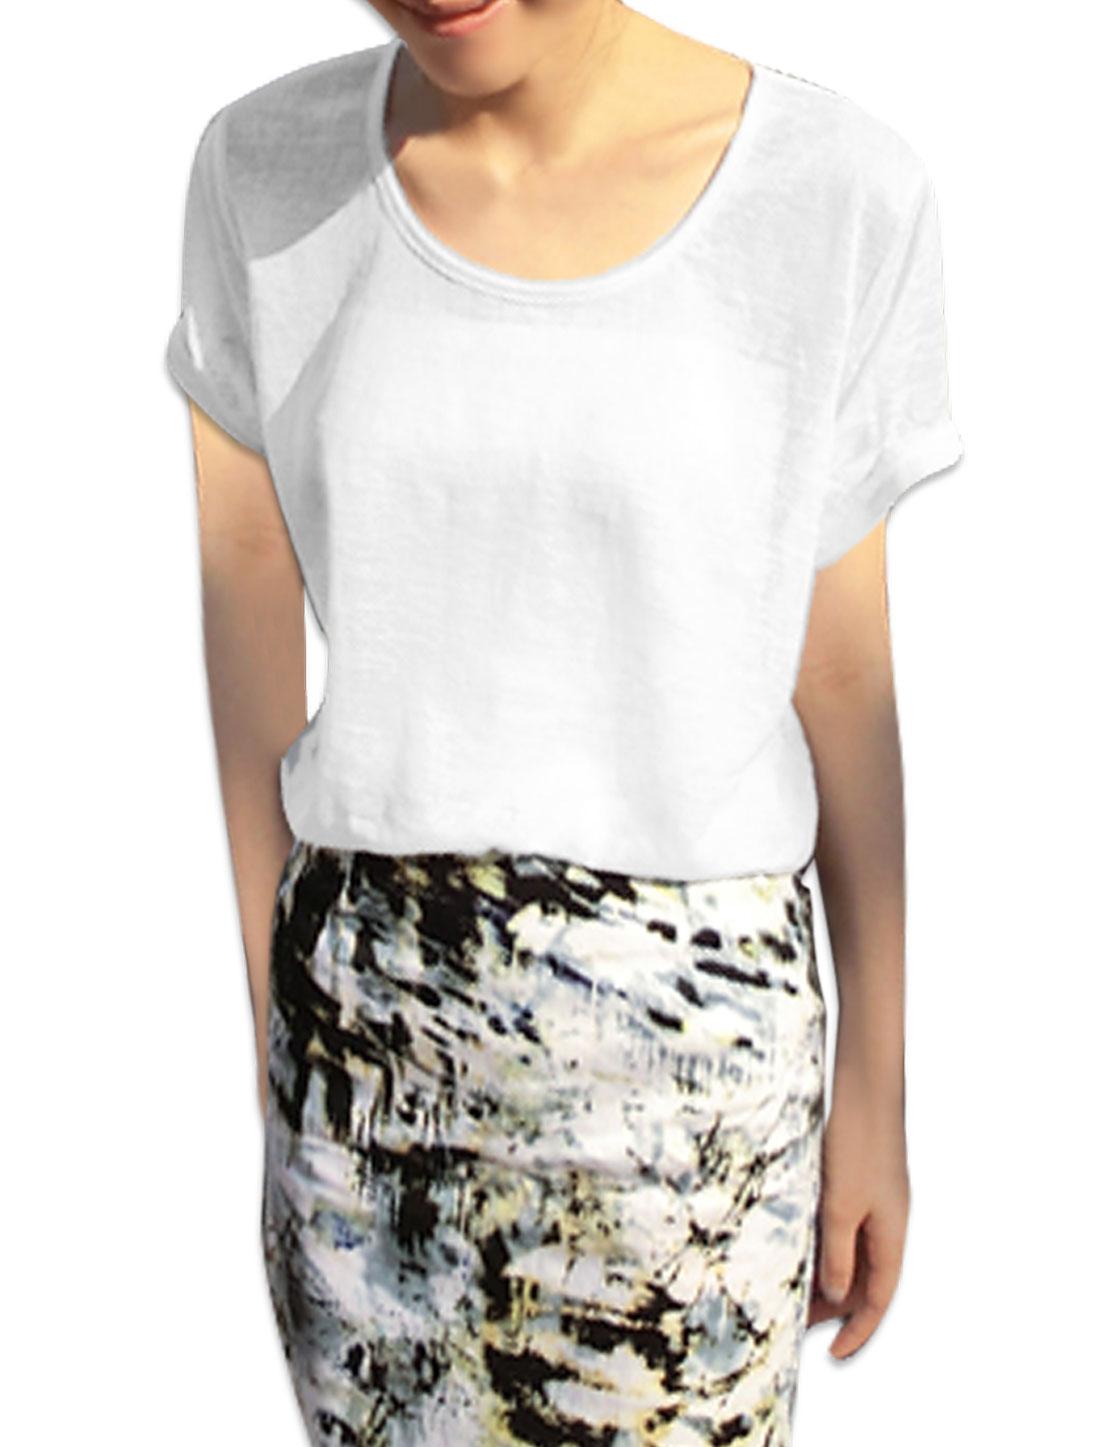 Women Strapless Plain Soft Tube Top w Pullover Semi Sheer T-Shirt XS White